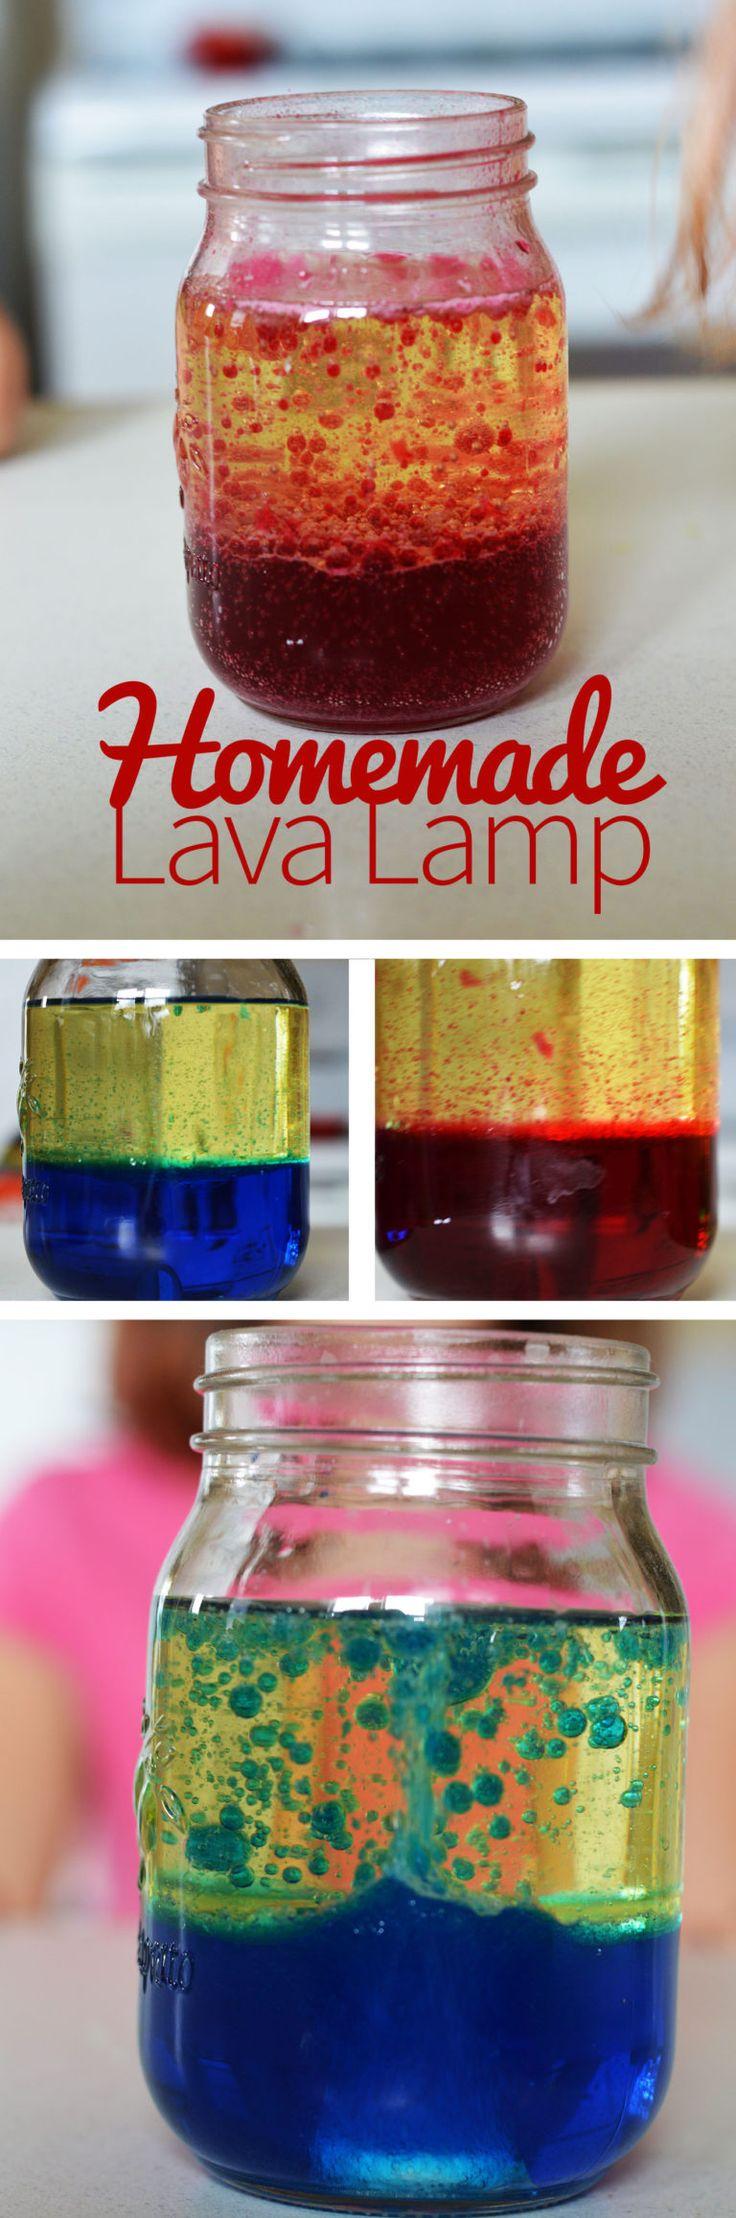 Homemade Lava Lamp